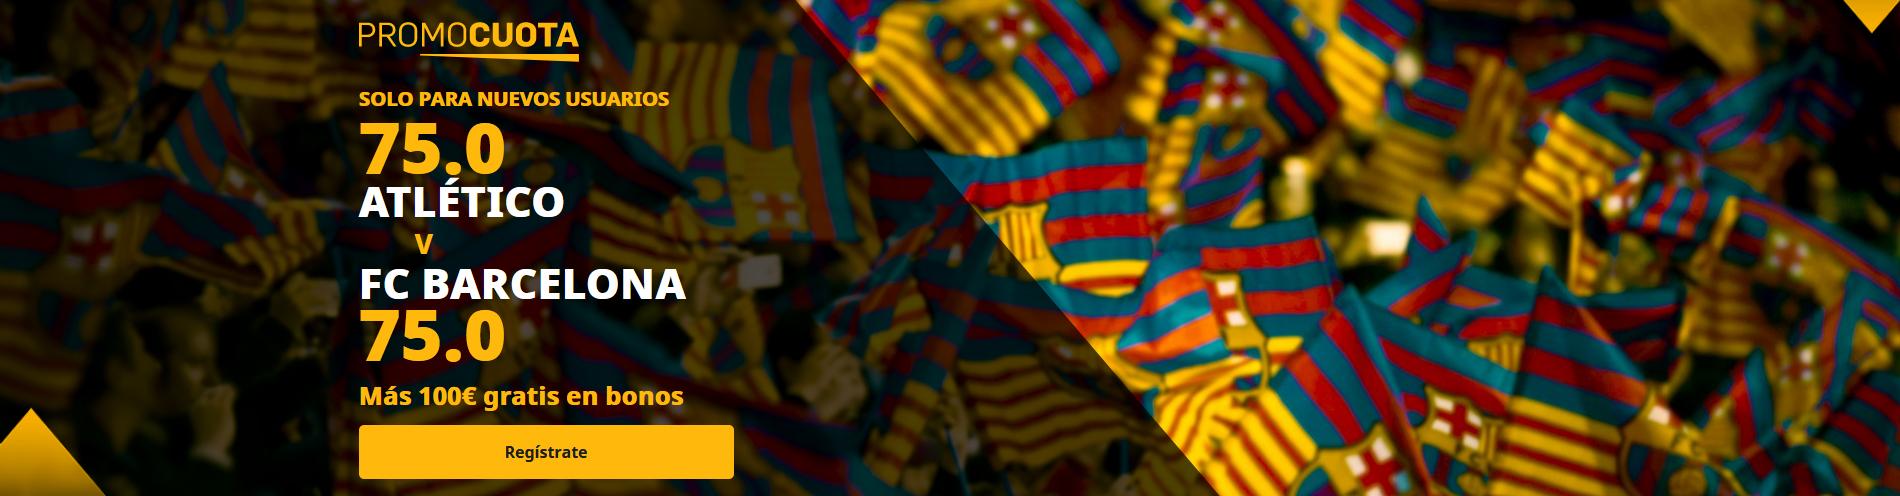 Promocuota doble Atlético vs Barcelona